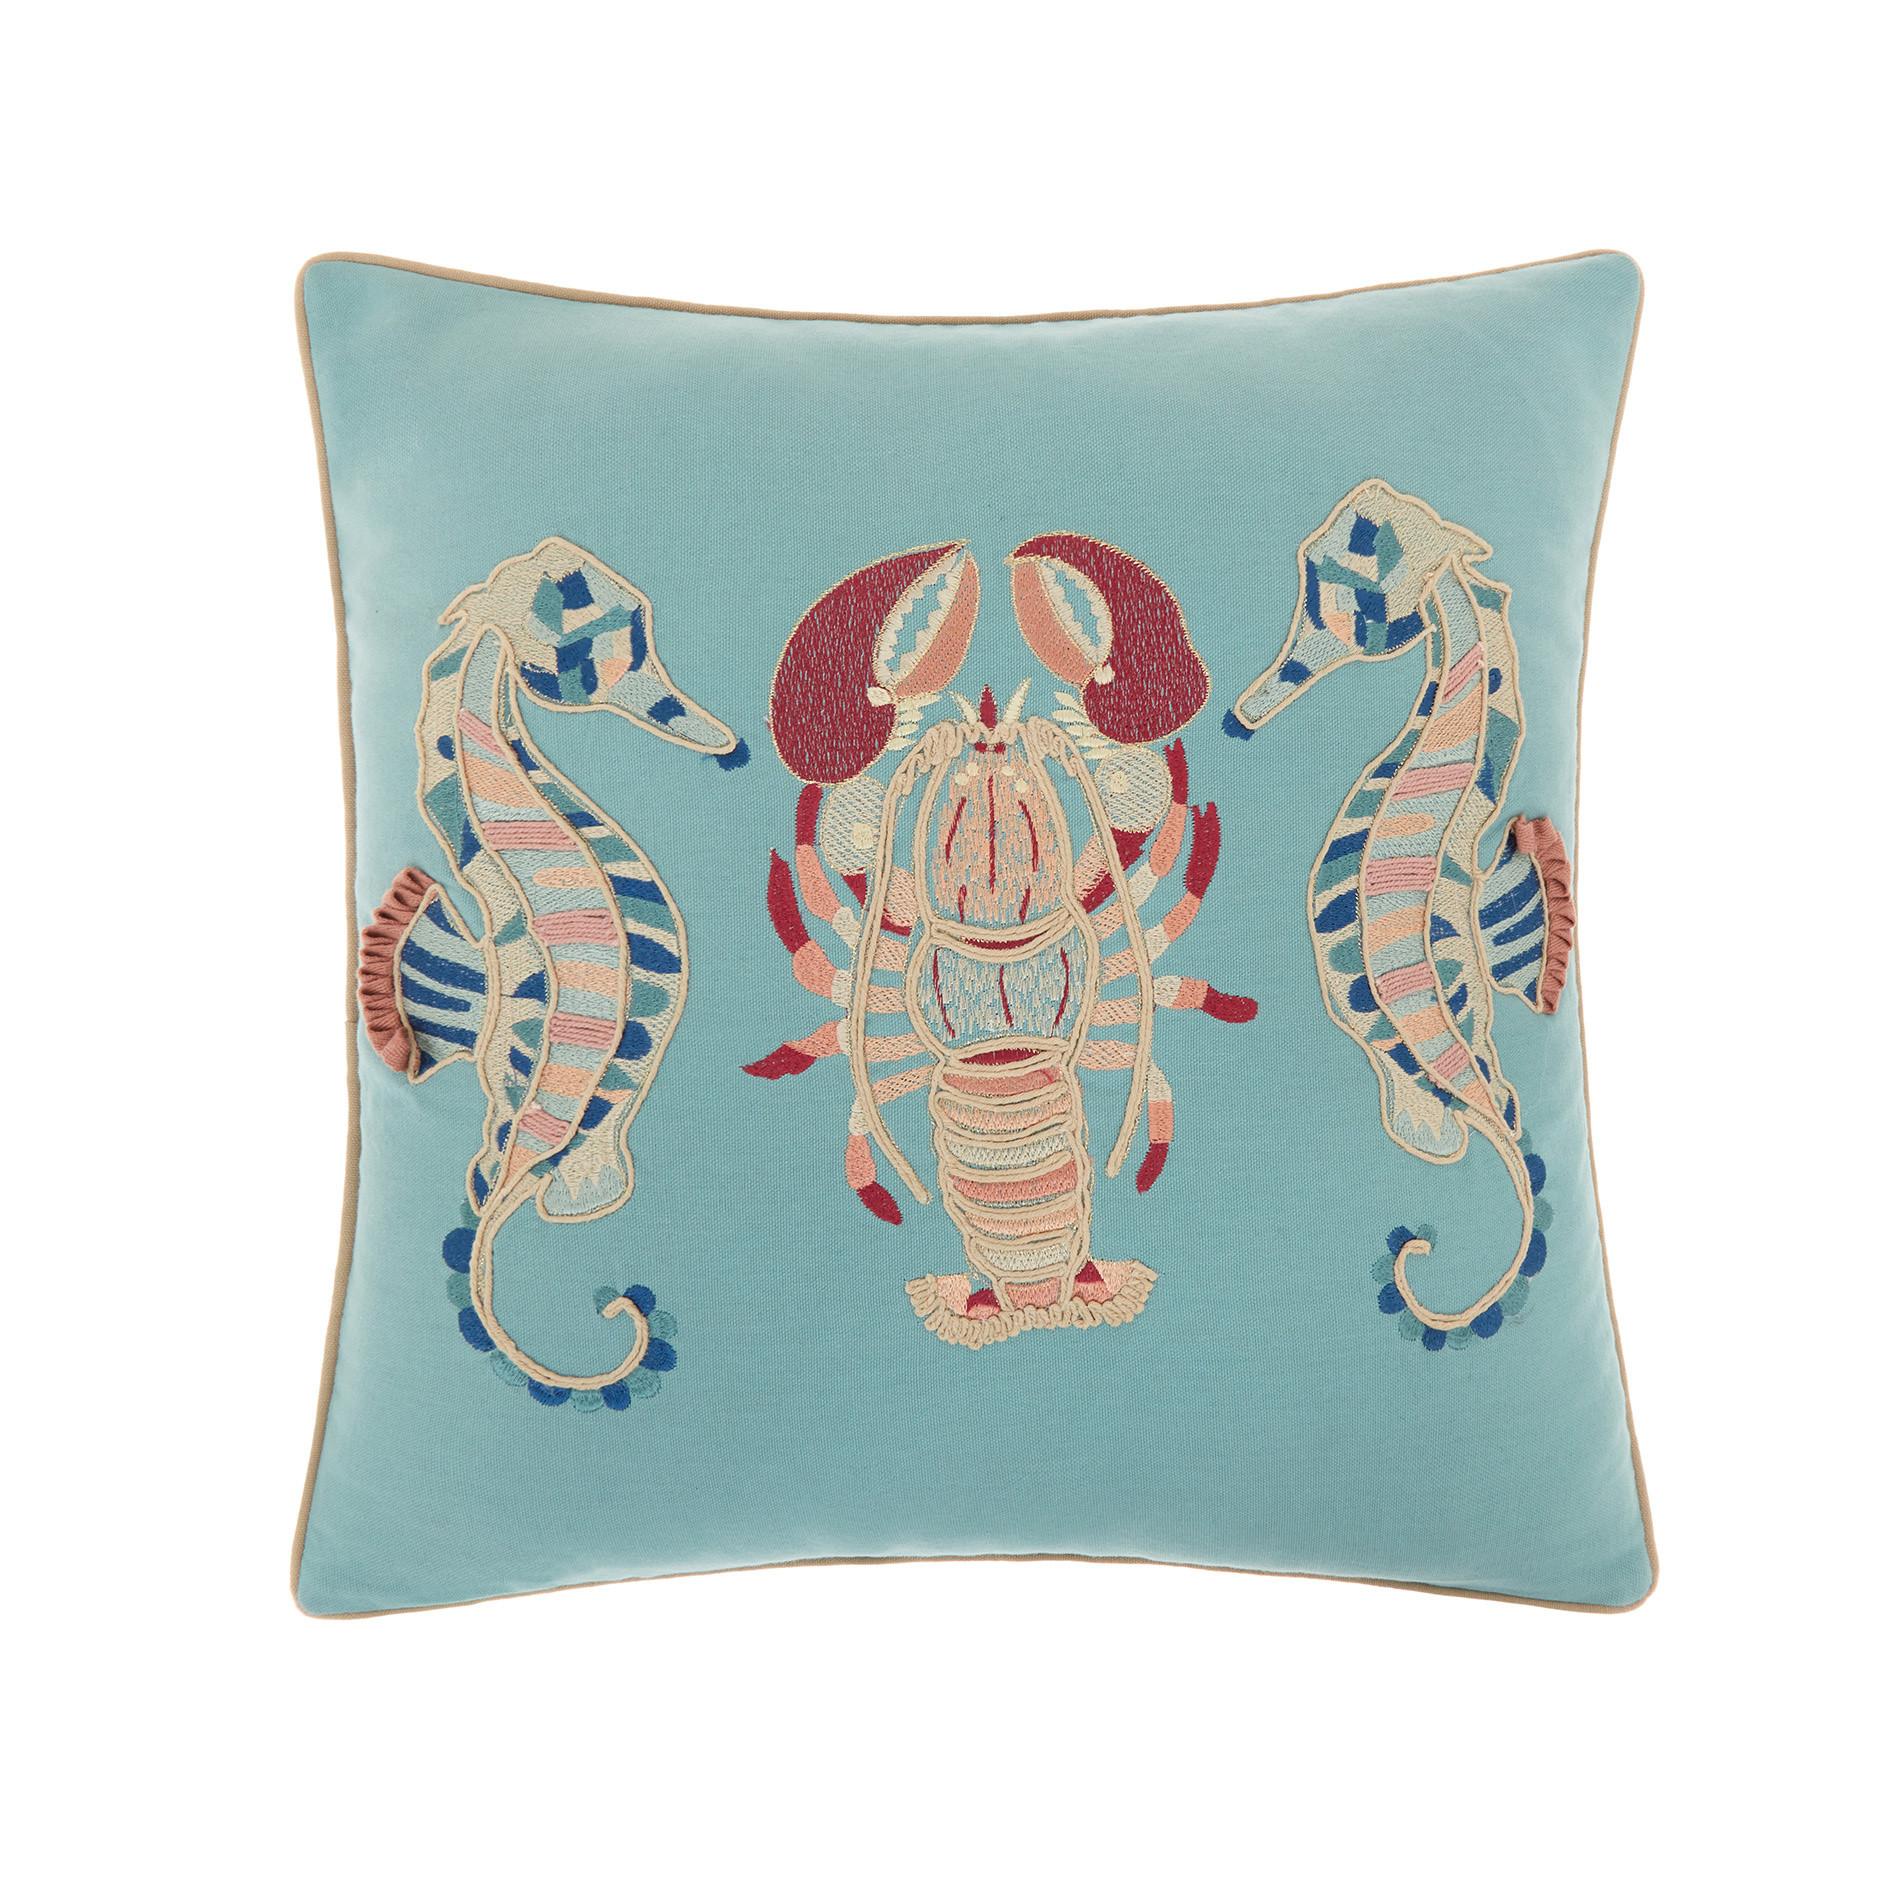 Cuscino ricamo animali marini 45x45cm, Azzurro, large image number 0